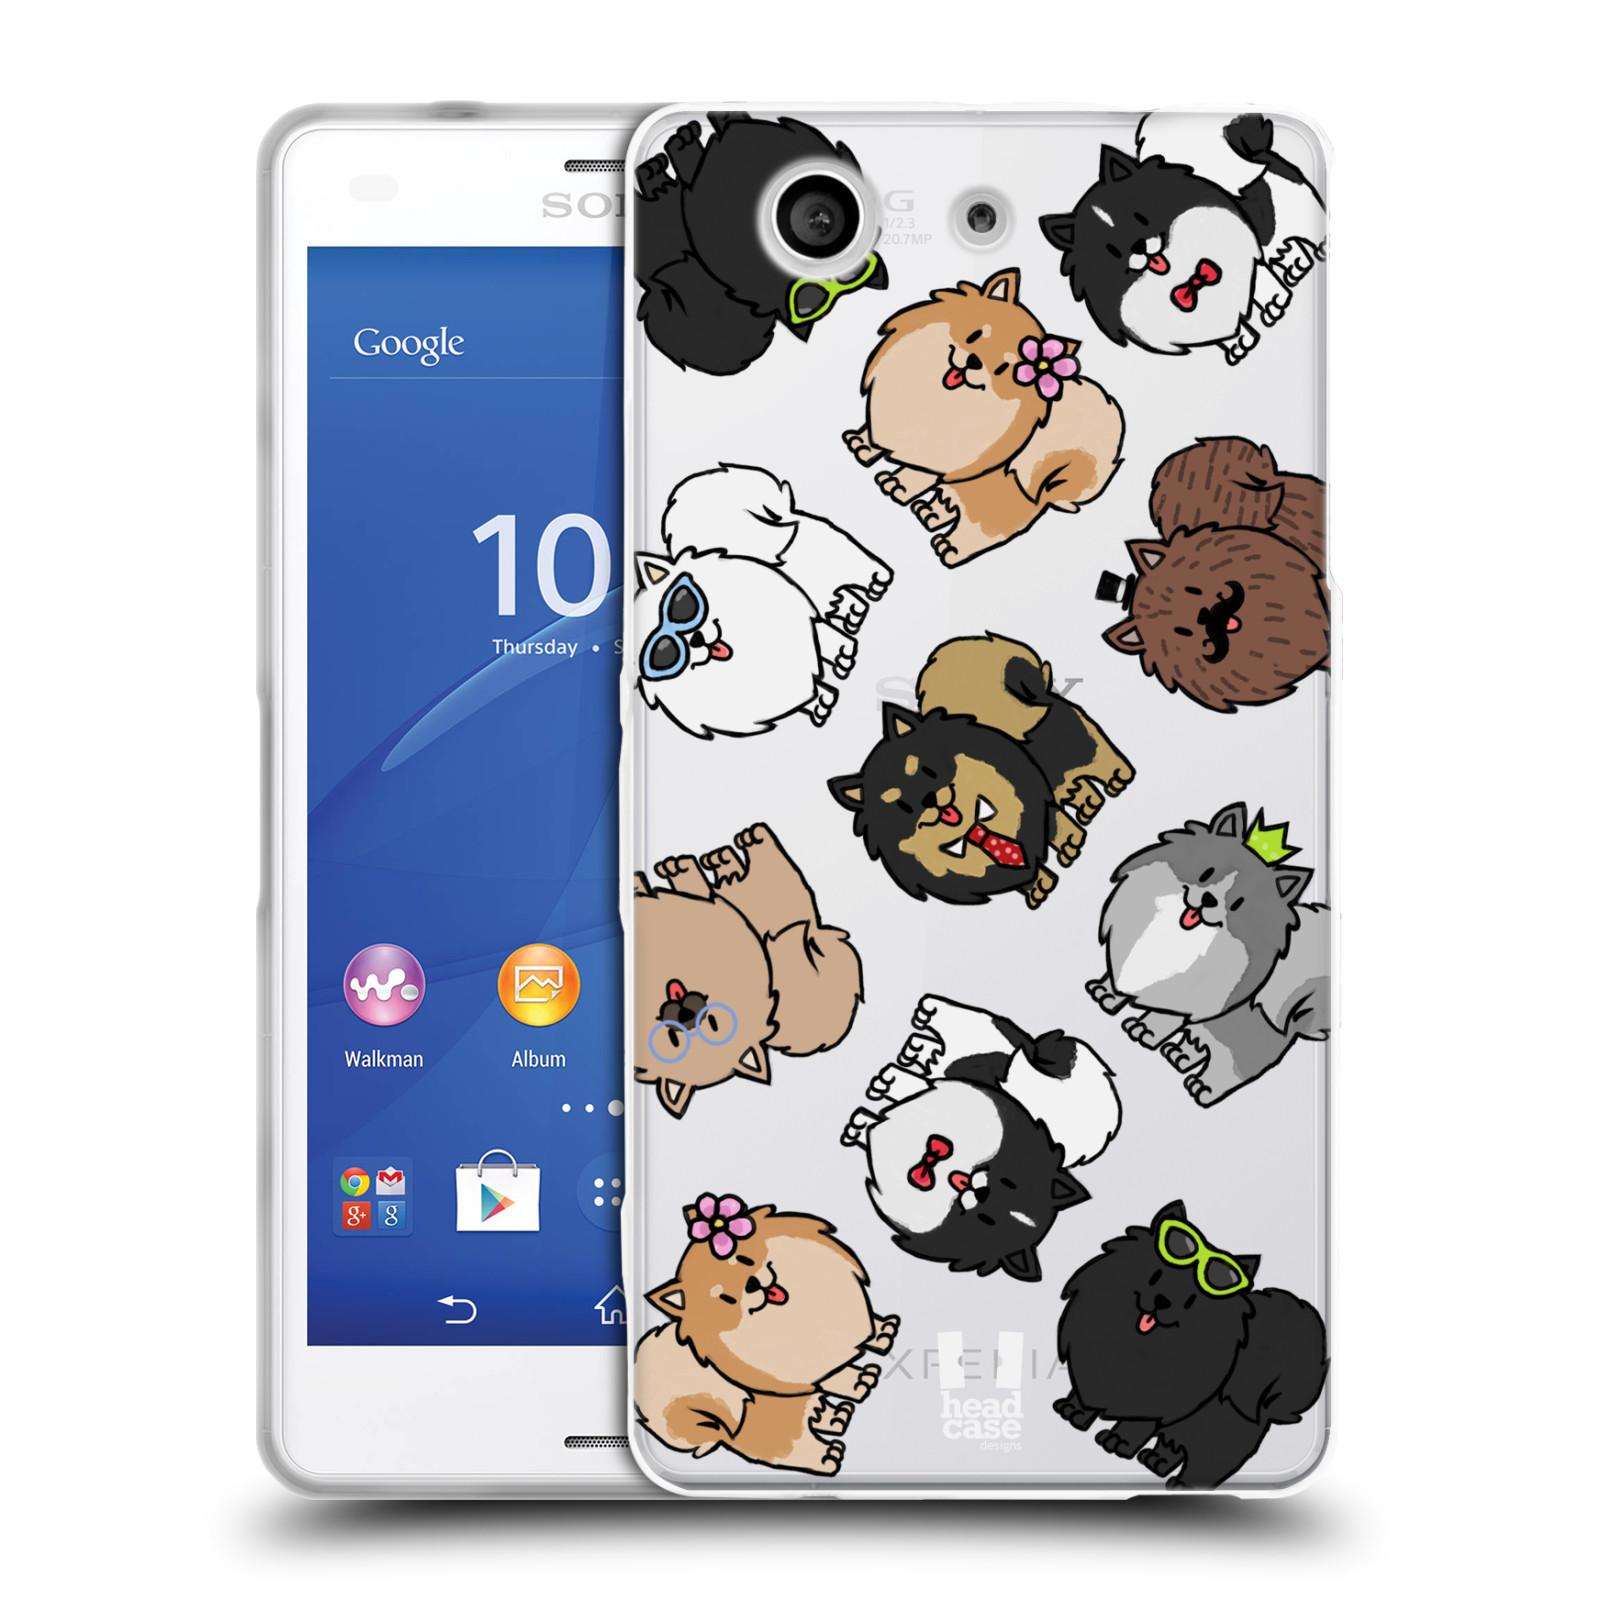 HEAD CASE silikonový obal na mobil Sony Xperia Z3 COMPACT pejsek Pomeranian